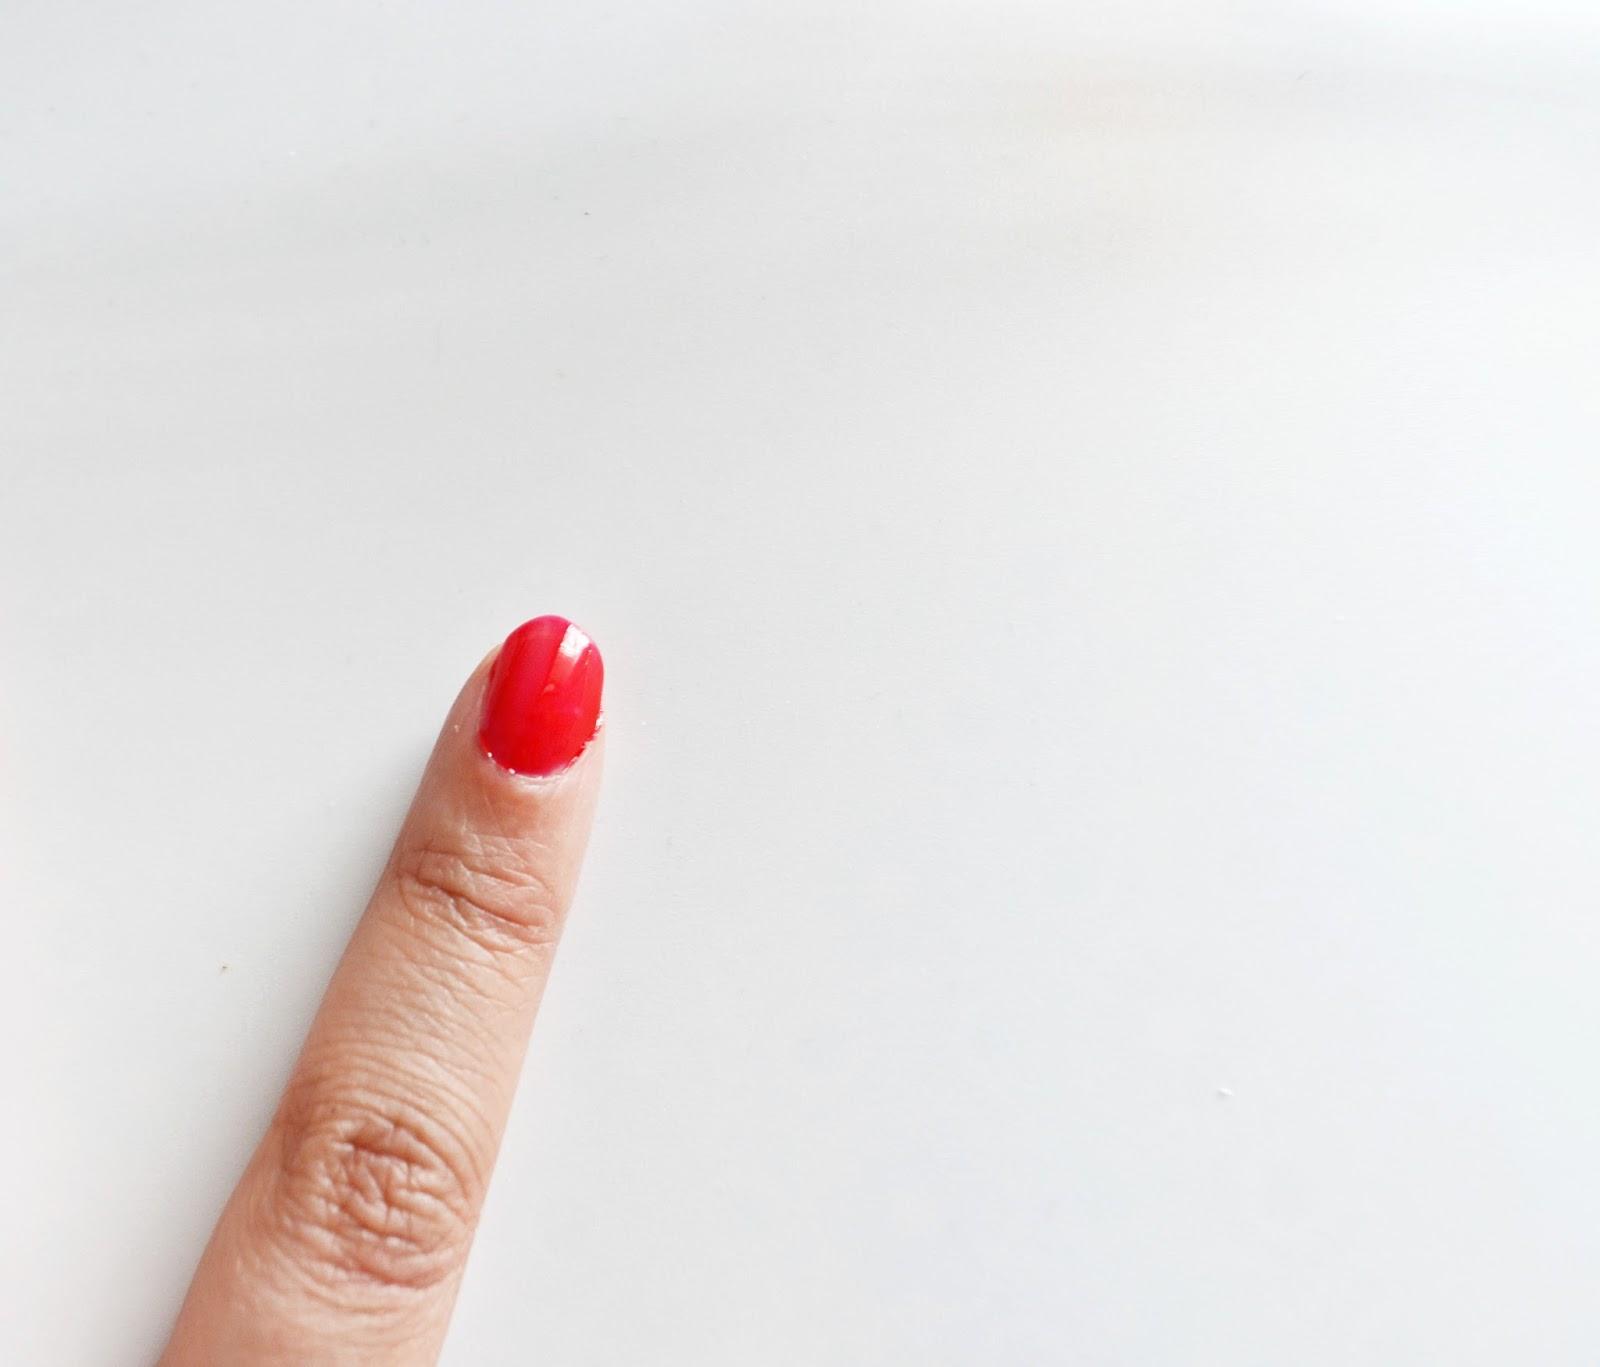 wash off nail varnish shiny and opaque